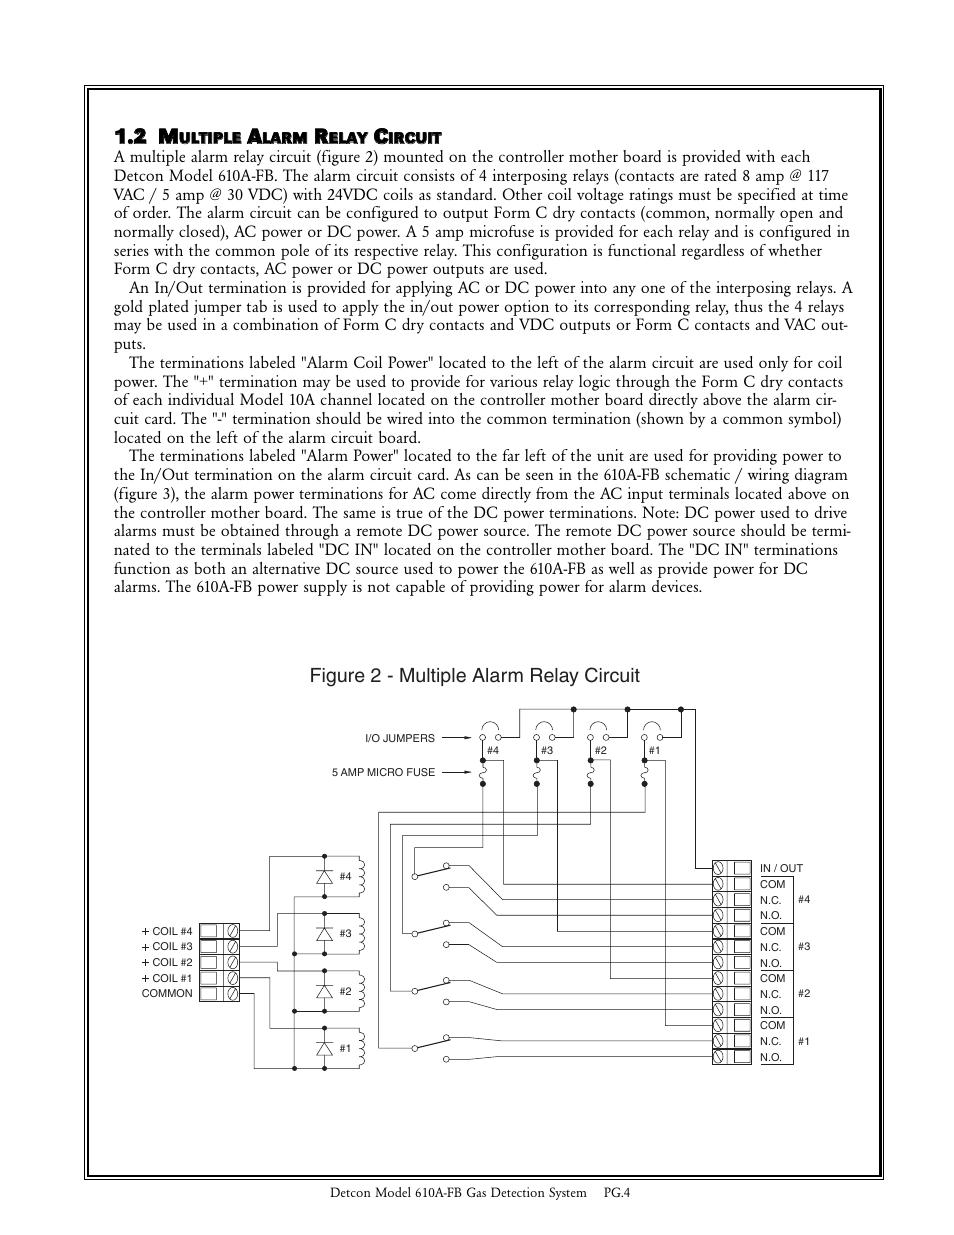 medium resolution of 11 2 m m figure 2 multiple alarm relay circuit detcon 610a fb user manual page 4 7